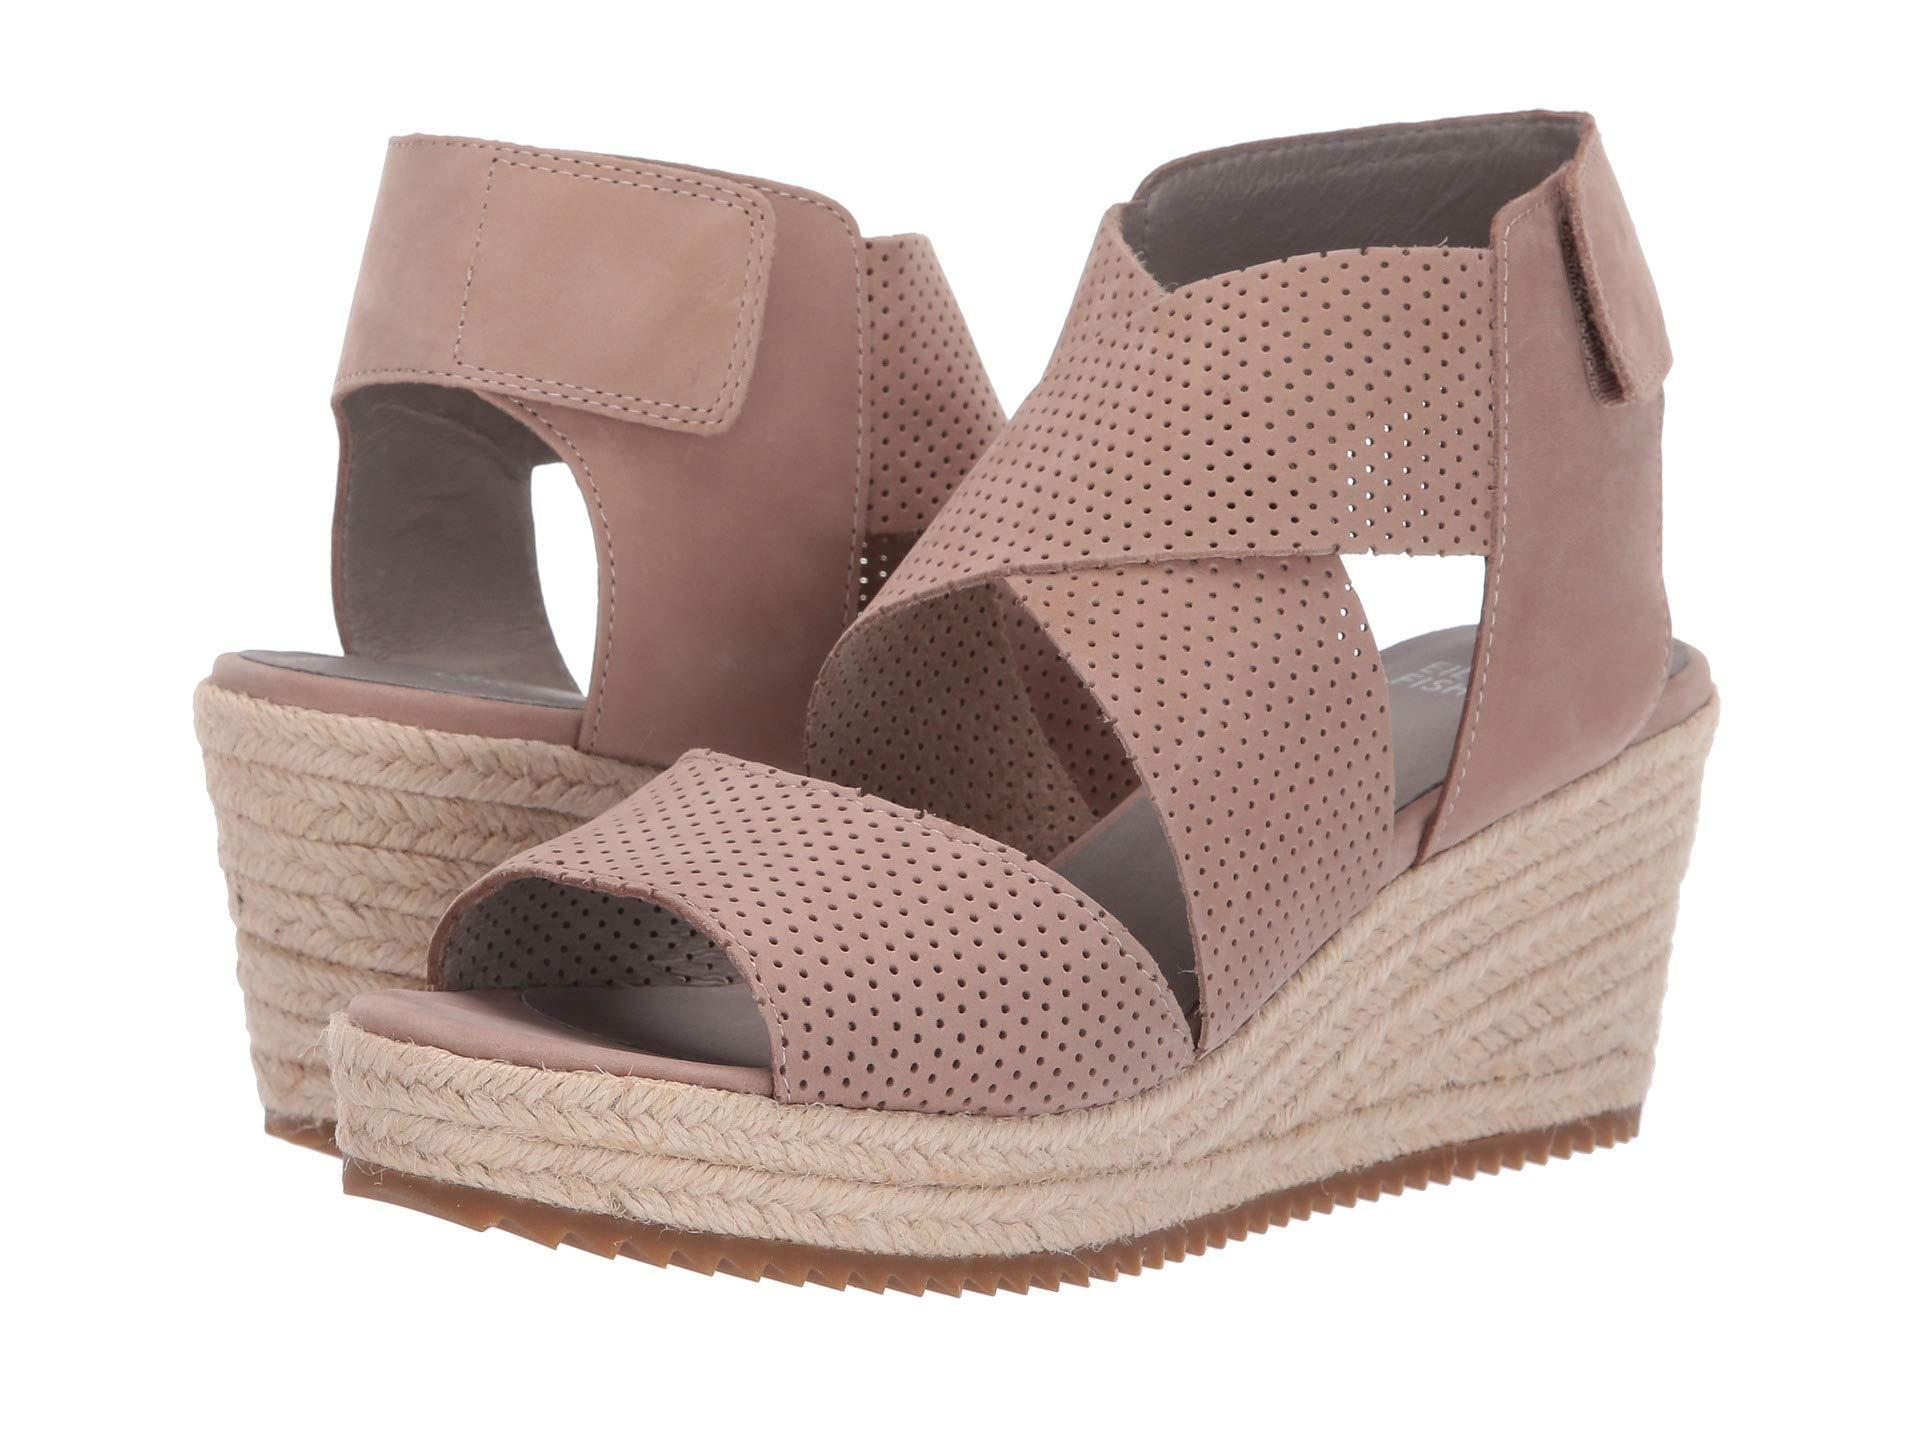 38e2e35add3 Lyst - Eileen Fisher Willow 2 (earth Nubuck) Women s Wedge Shoes